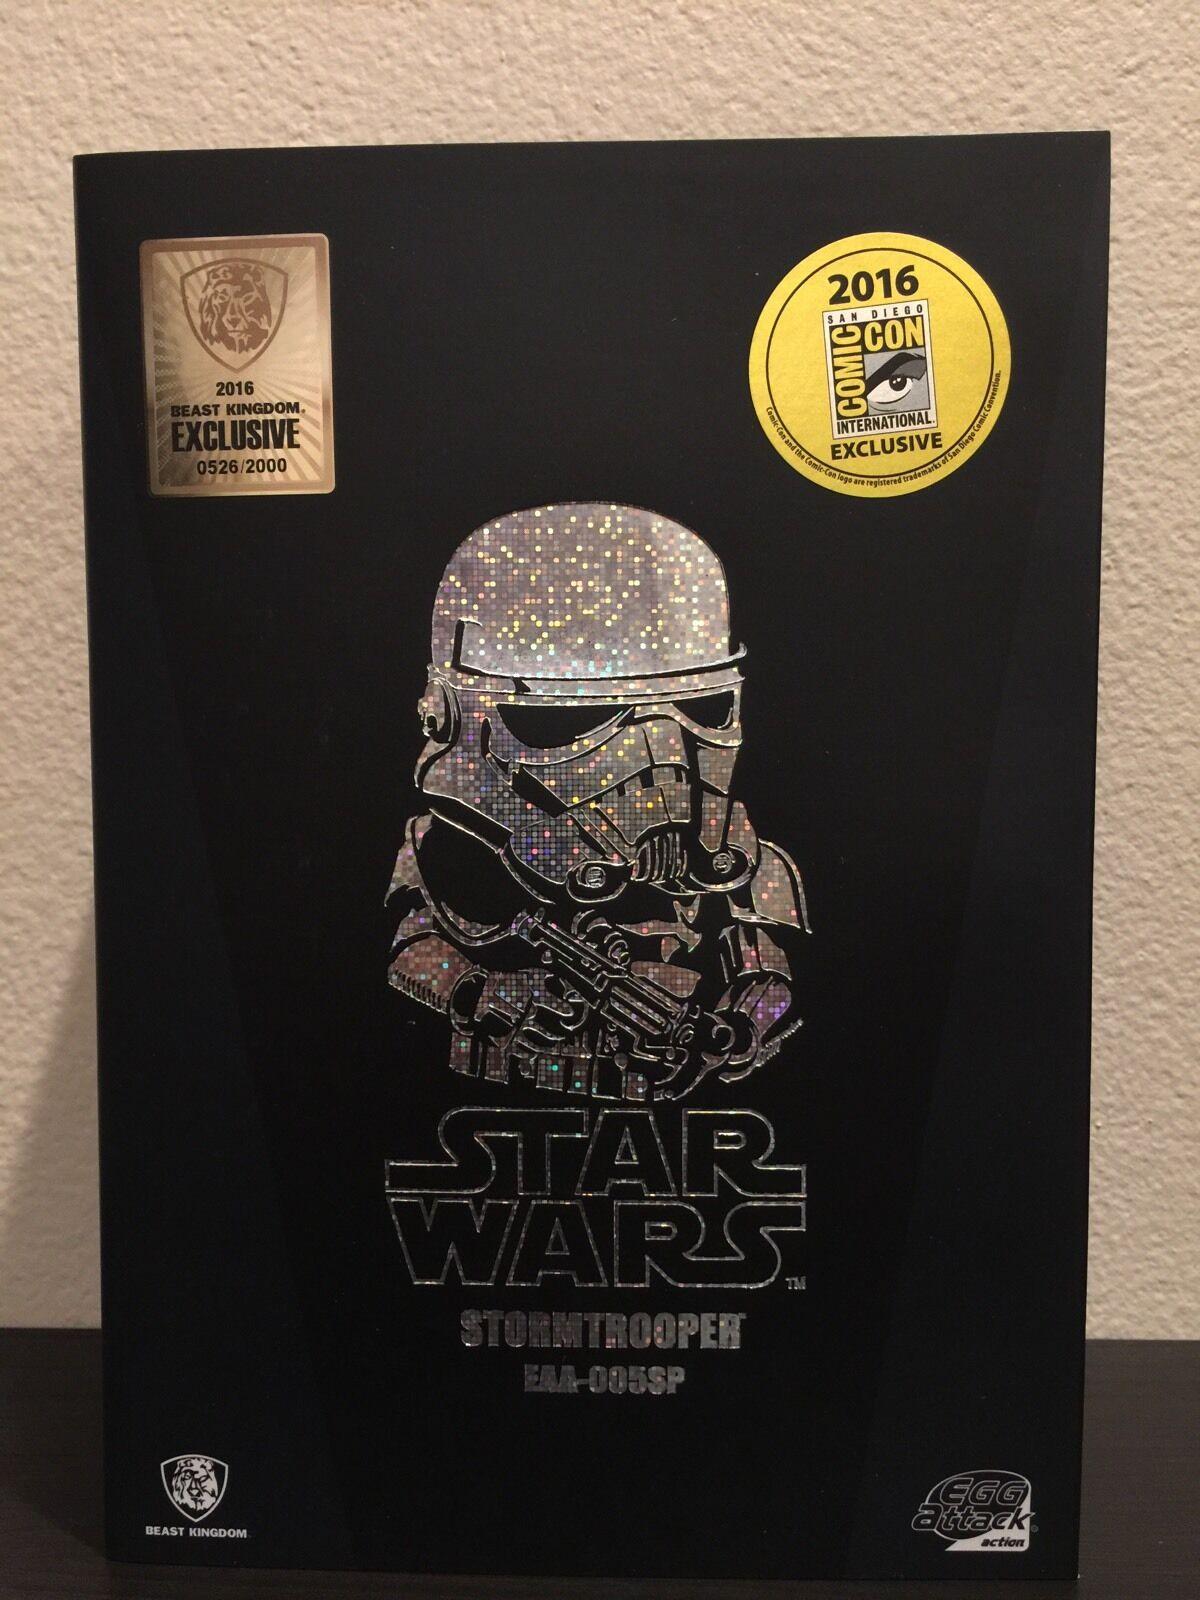 Star Wars Egg Attaque Stormtrooper  Beast Kingdom  San Diego comic-con Exclusive  EAA-005SP